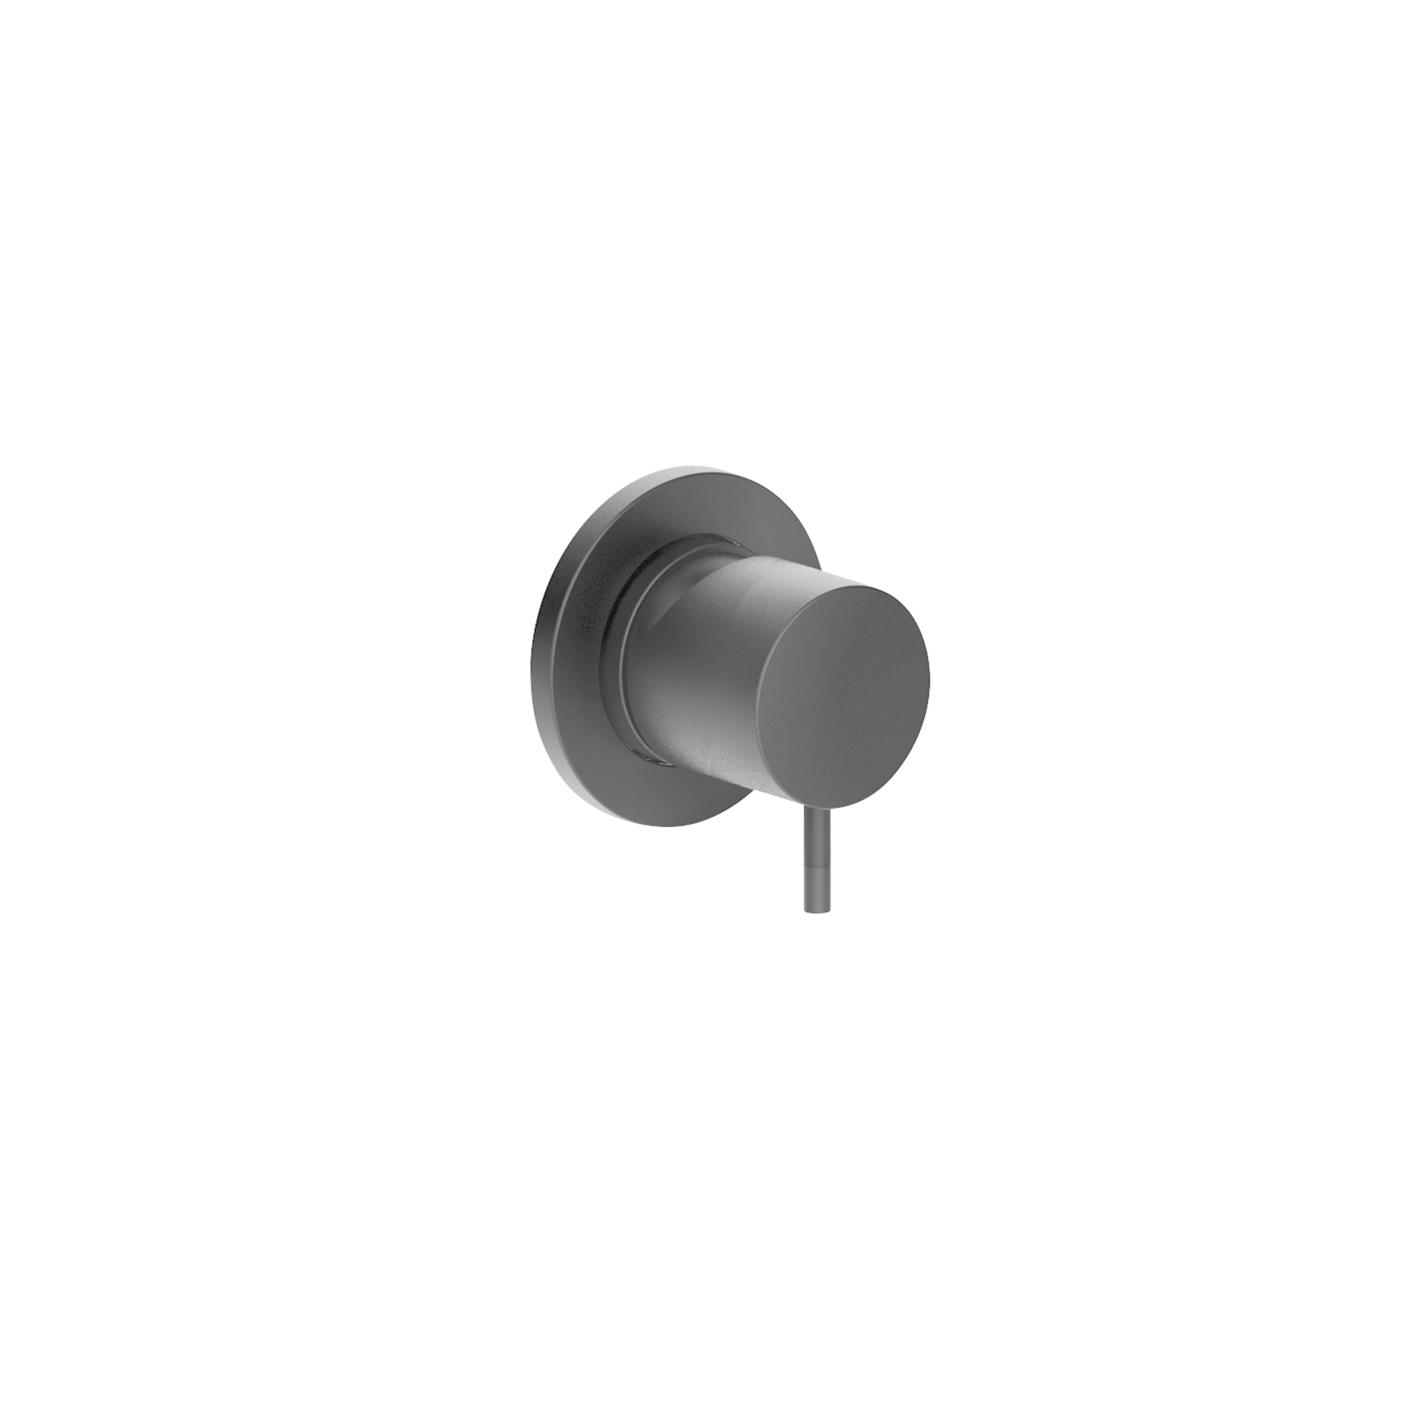 p063b + m063a fontane bianche shower mixer